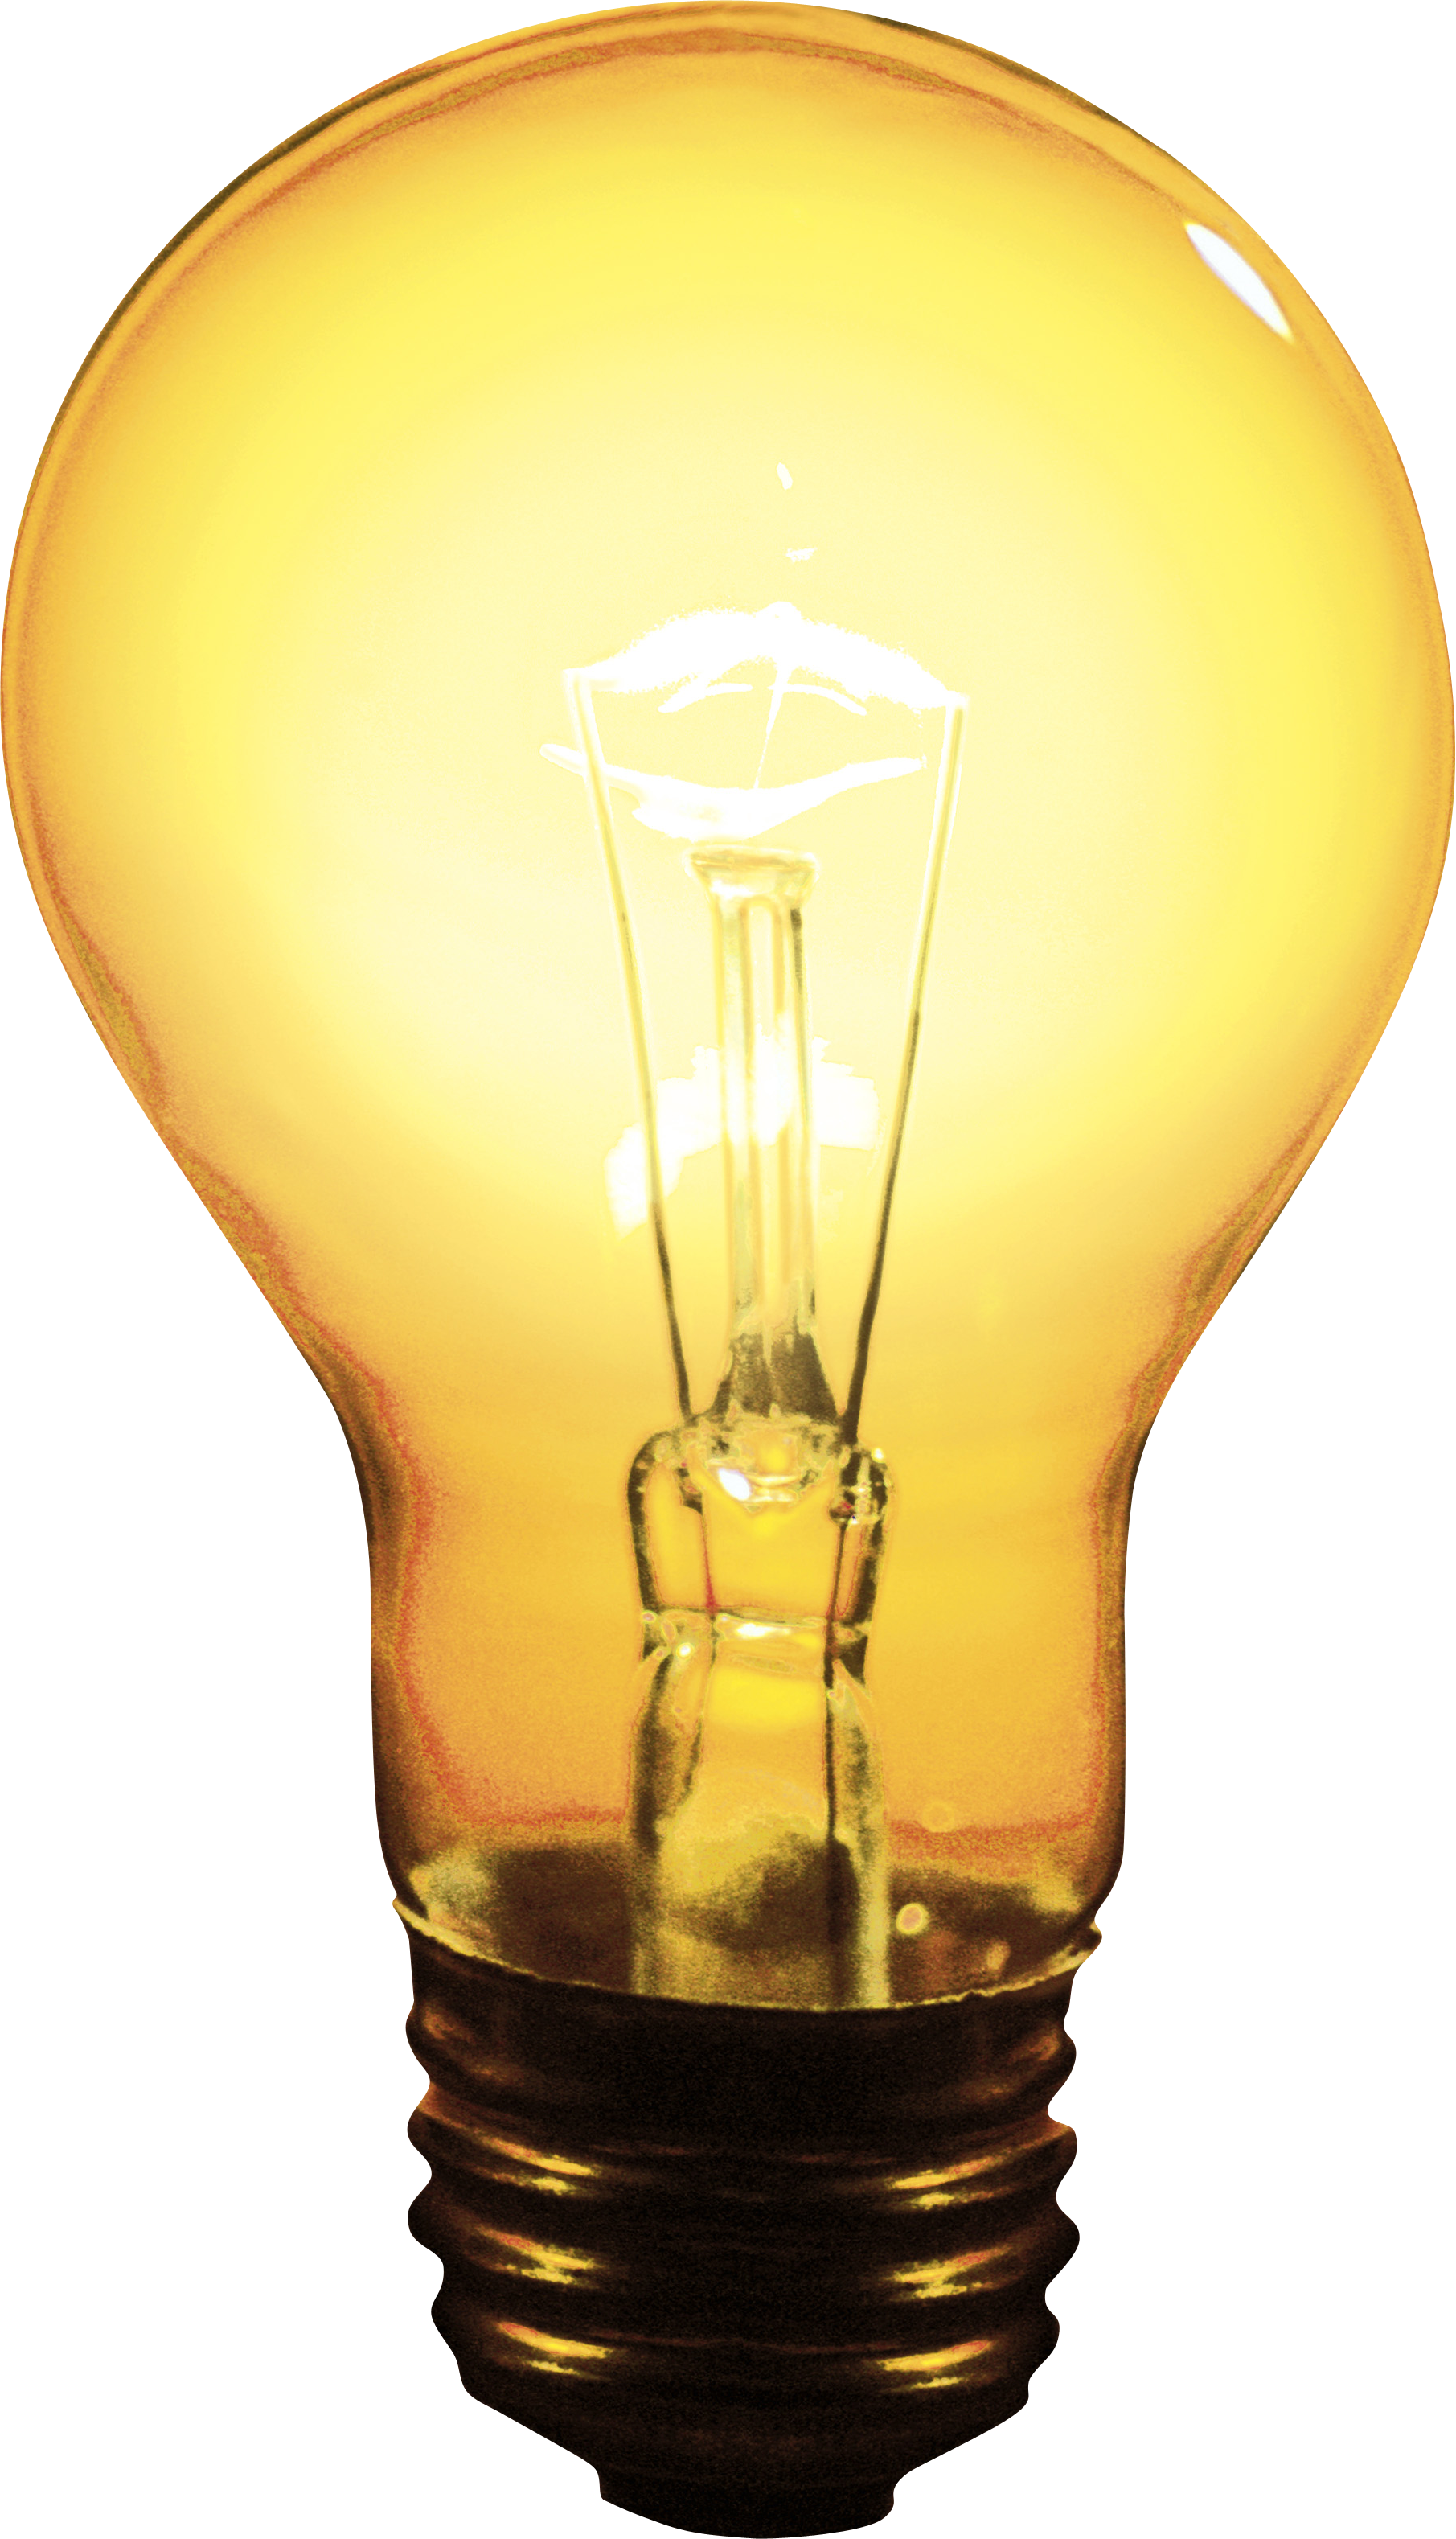 Png p balance pinterest. Lamp clipart sound light